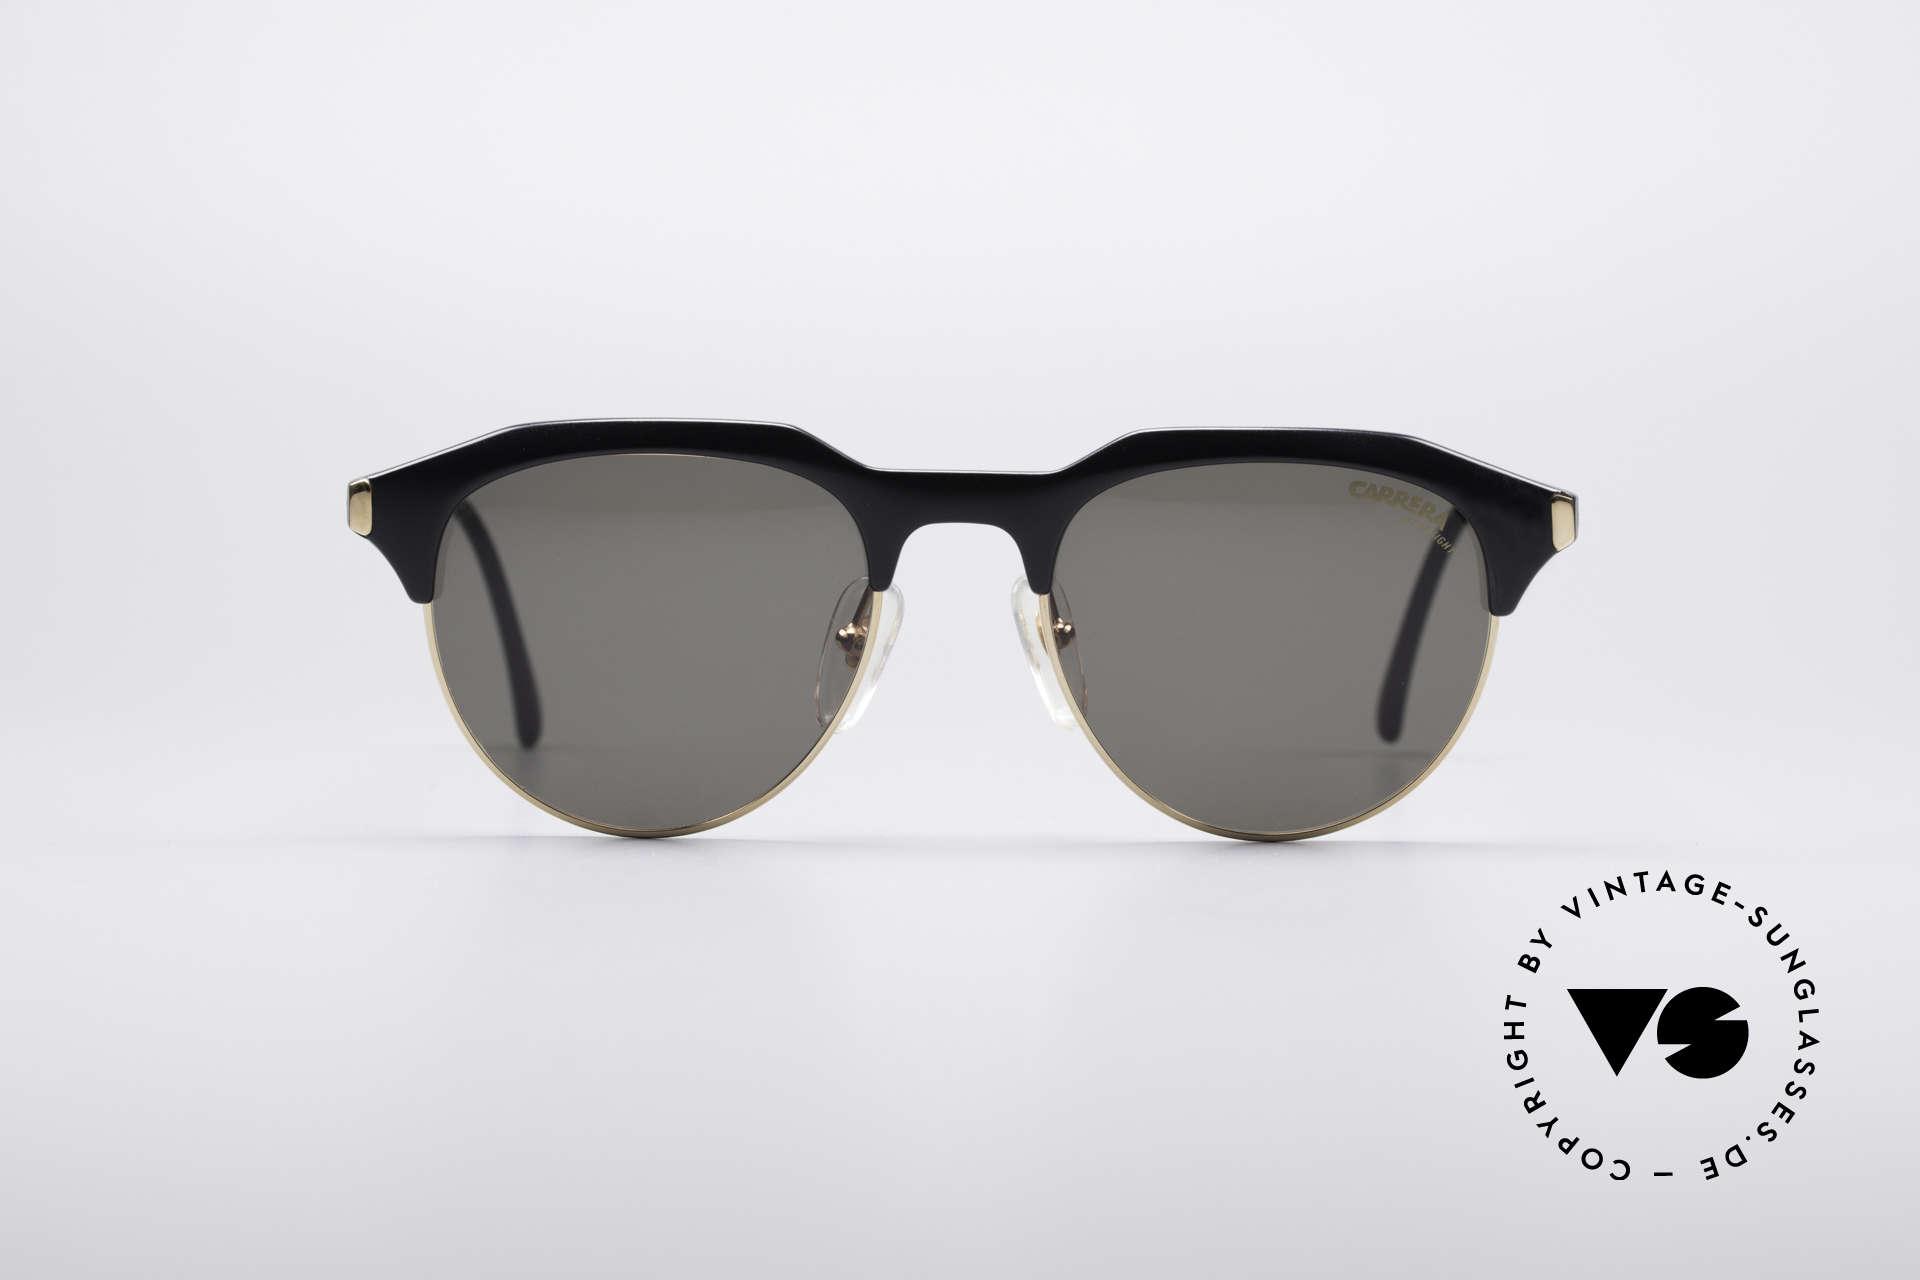 23c8d68fa882 Sunglasses Carrera 5475 Vintage Panto Sunglasses   Vintage Sunglasses